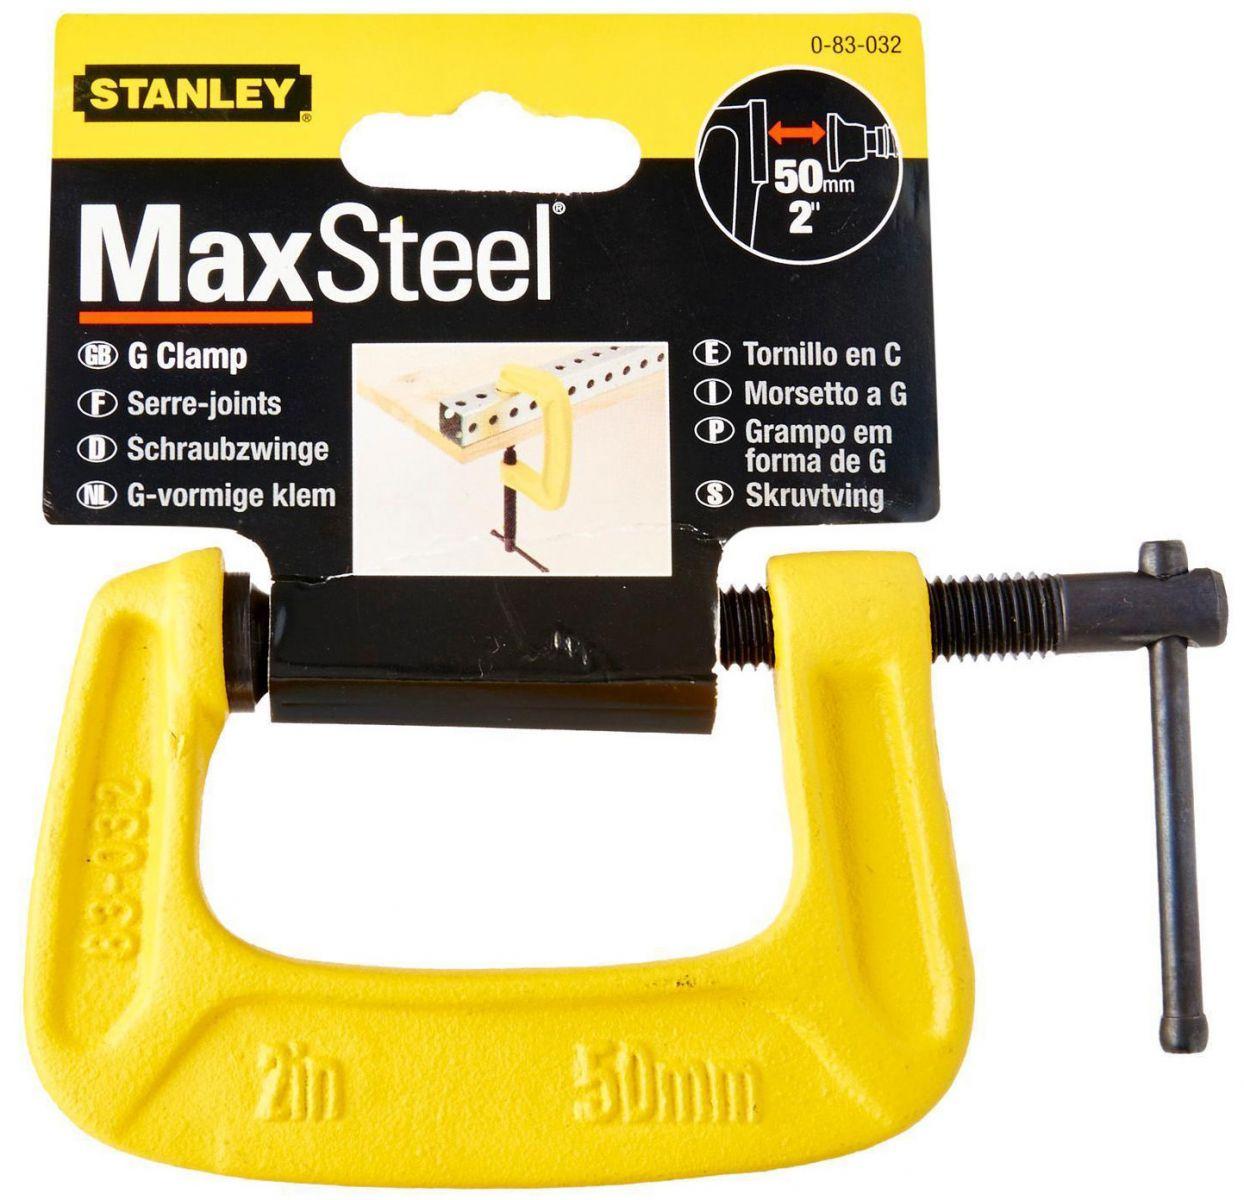 "Kẹp kiểu chữ C 2"" Stanley 83-032K"